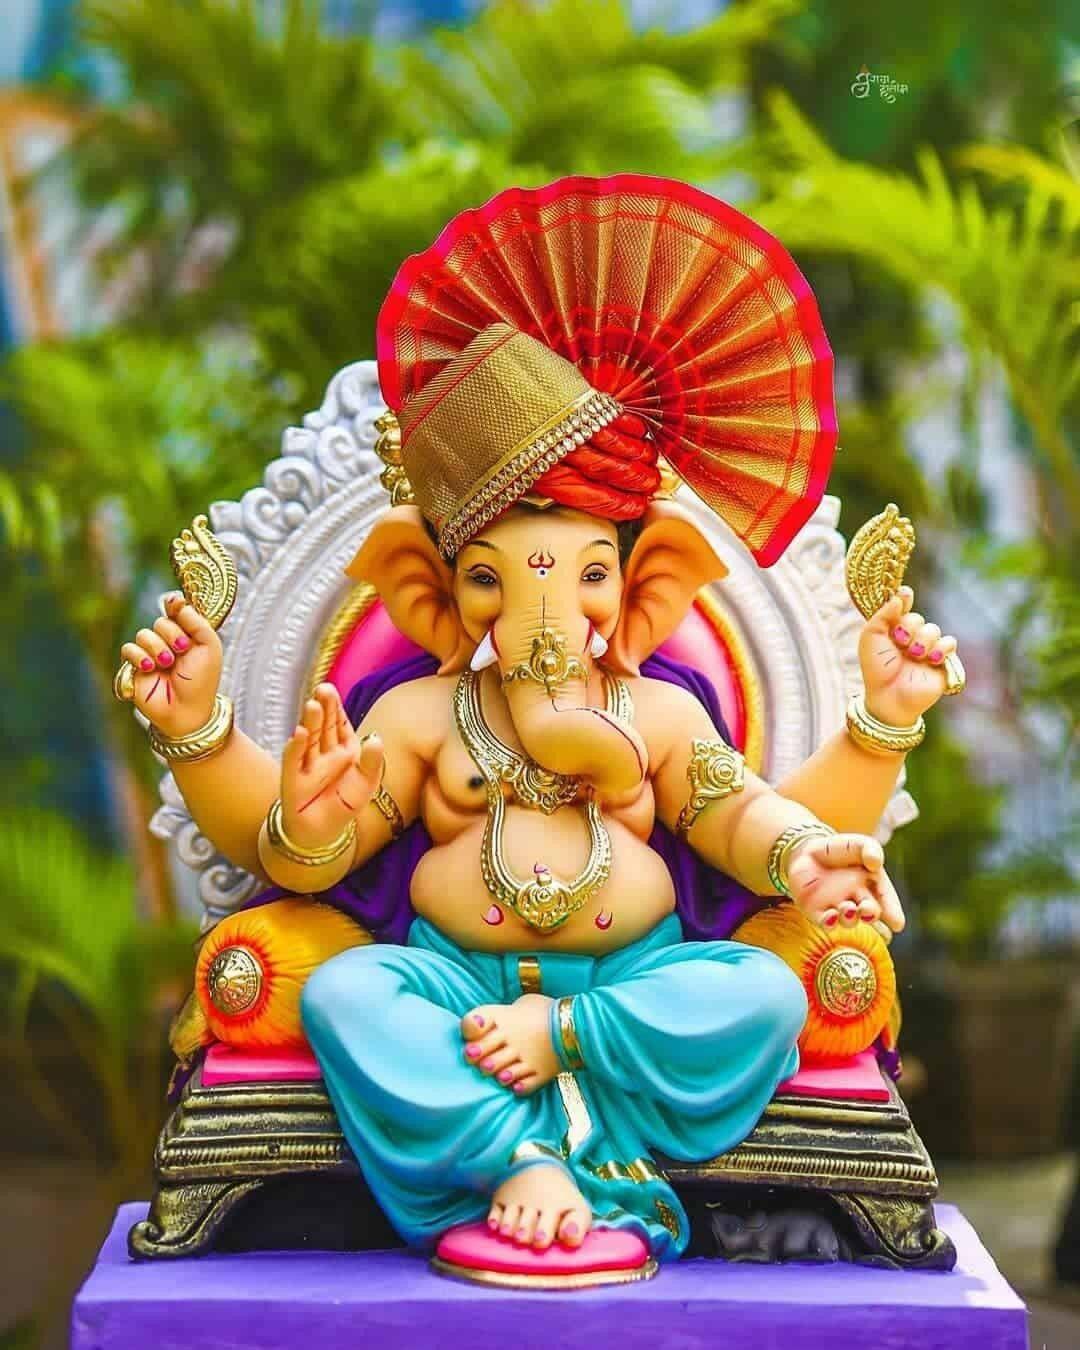 Ganesh Chaturthi 2020 Ganesh Images Shri Ganesh Images Happy Ganesh Chaturthi